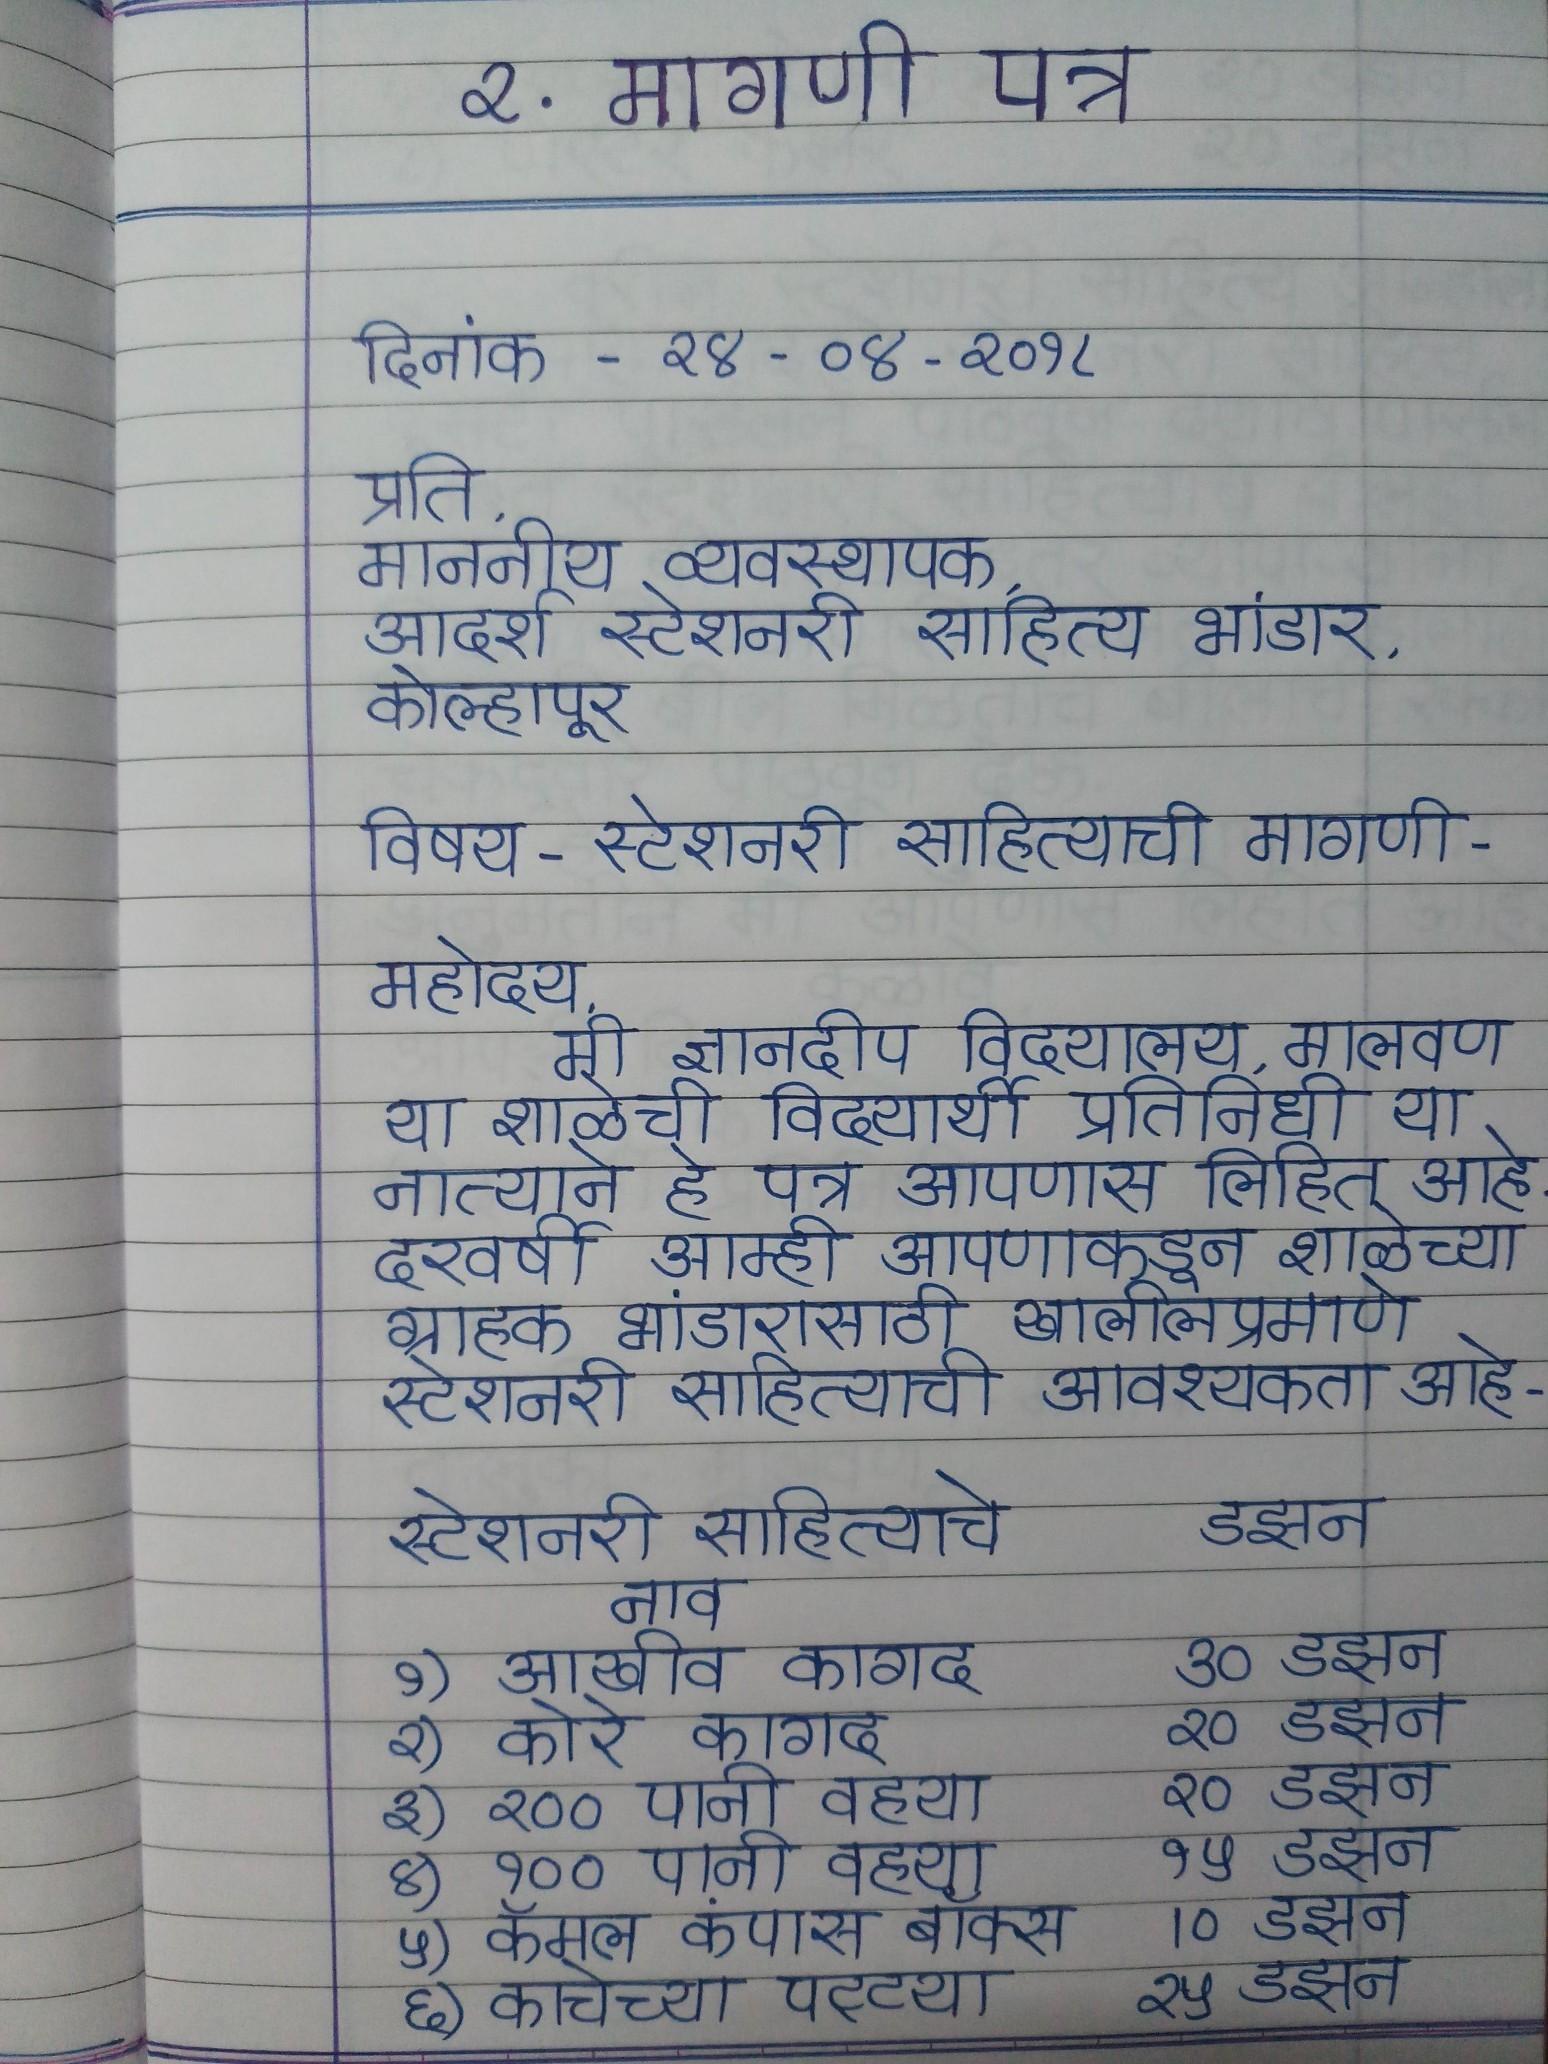 Magni patra in marathi - Brainly in